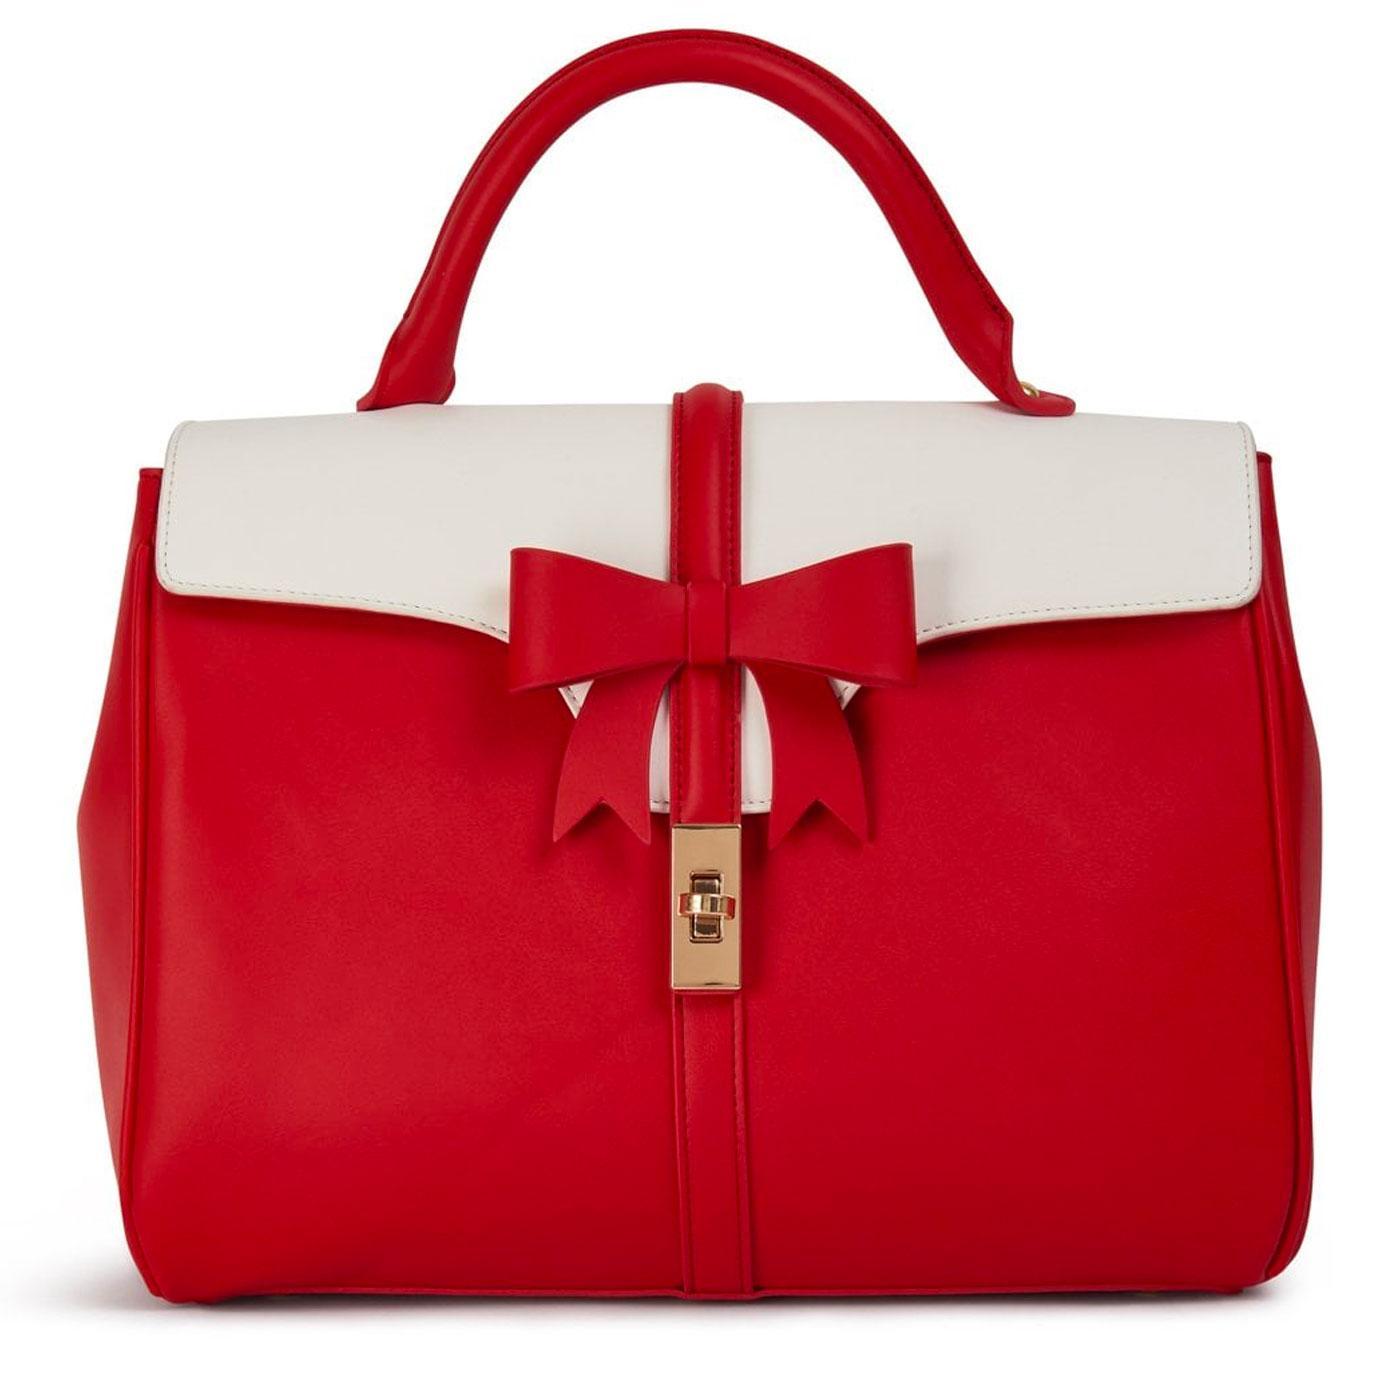 Roberta LULU HUN Retro Vintage Bow Bag in Red